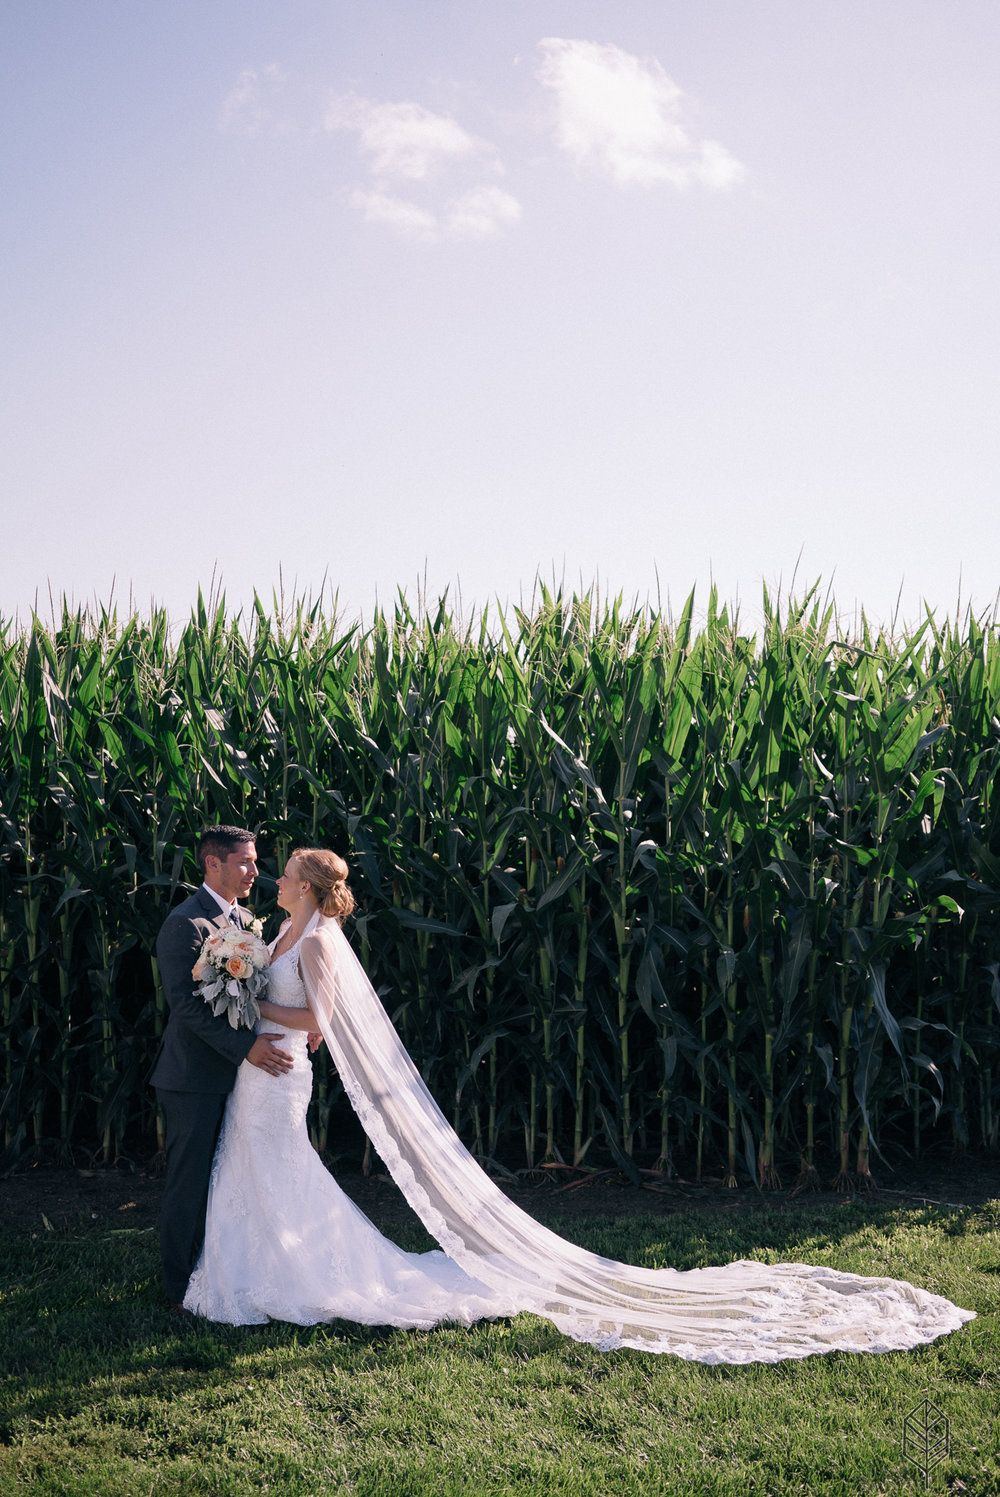 johnsonscreative_Ambrosia_wedding-39.jpg